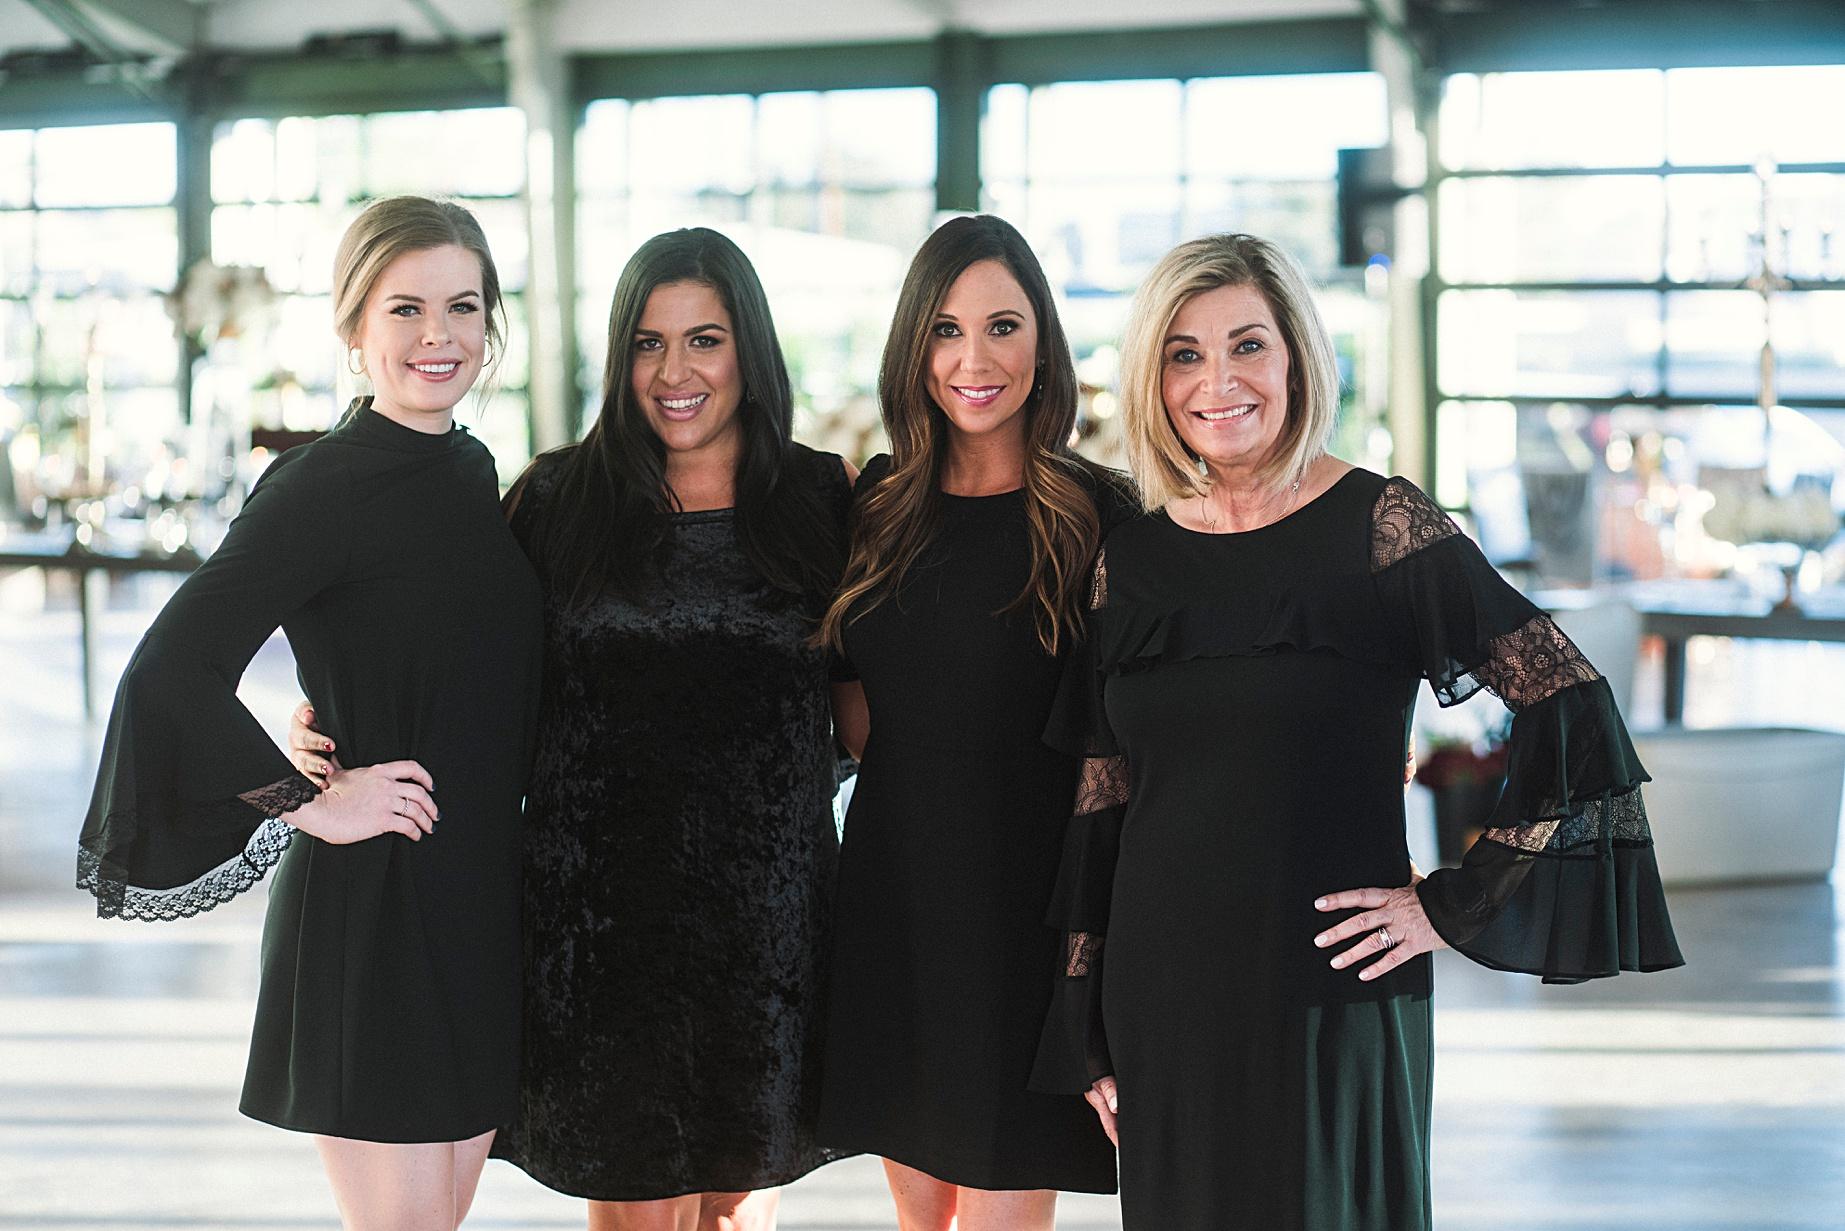 The Clayton Girls